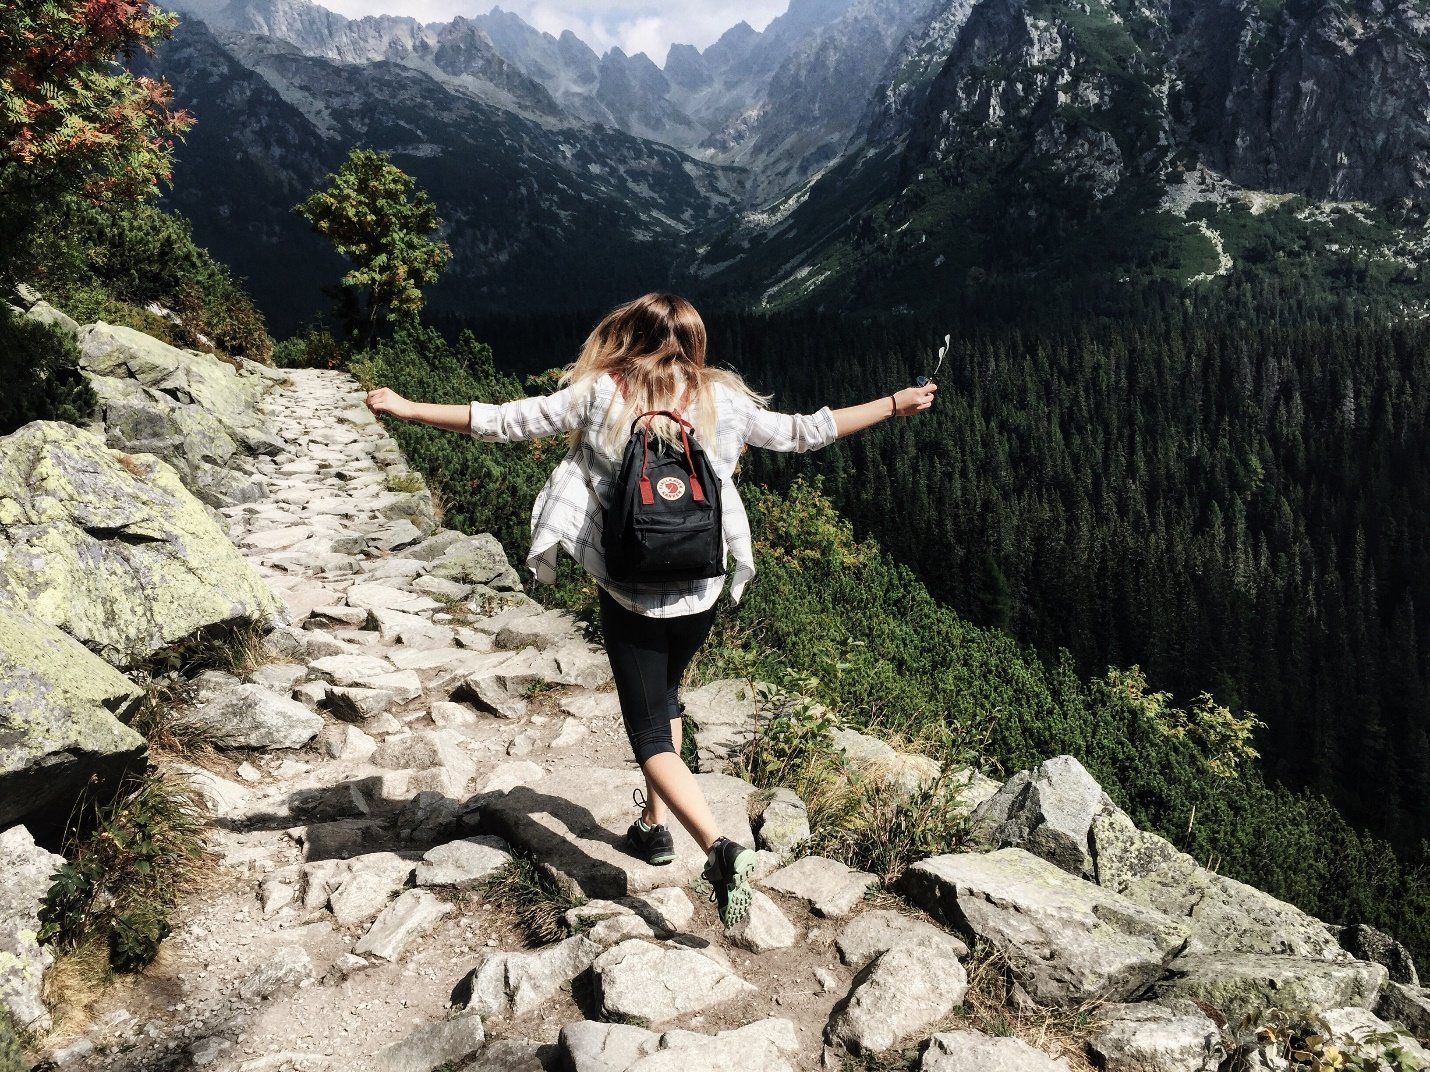 Camping woman on rocks